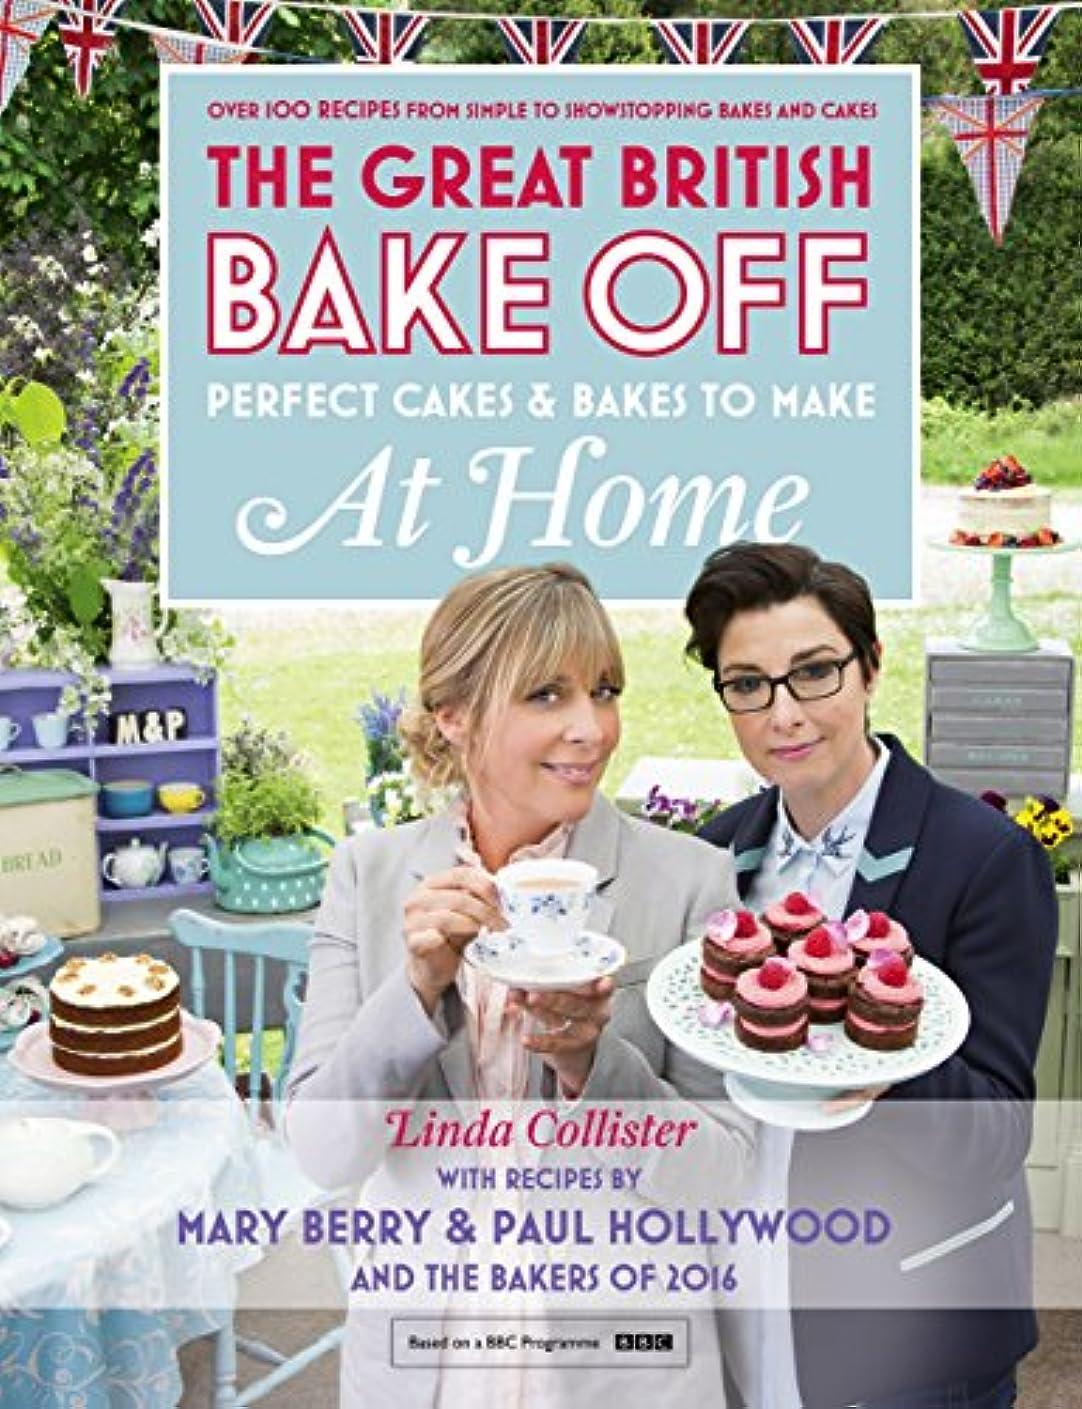 Great British Bake Off - Perfect Cakes & Bakes To Make At Home (English Edition)